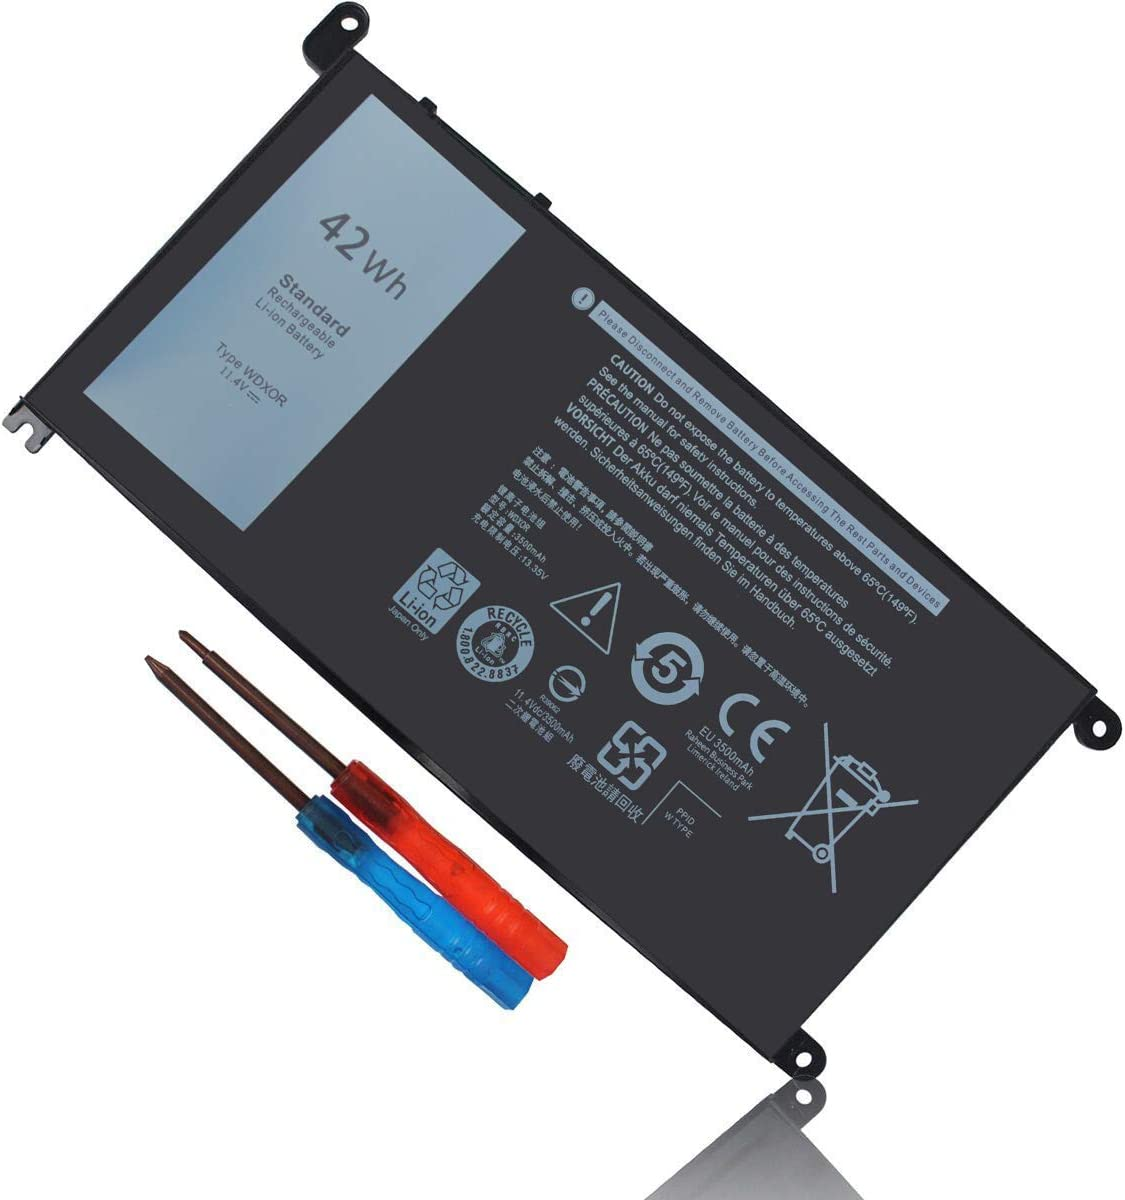 WDXOR WDX0R Laptop Battery for Dell Inspiron 15 5568 5578 5378 7579 7569 5565 7570 7560 5570 5579 5567 7573 P58F 17 5767 5765 5770 13 5368 7378 7368 5379 14 7460 3CRH3 FC92N T2JX4 CYMGM -42Wh/11.4V